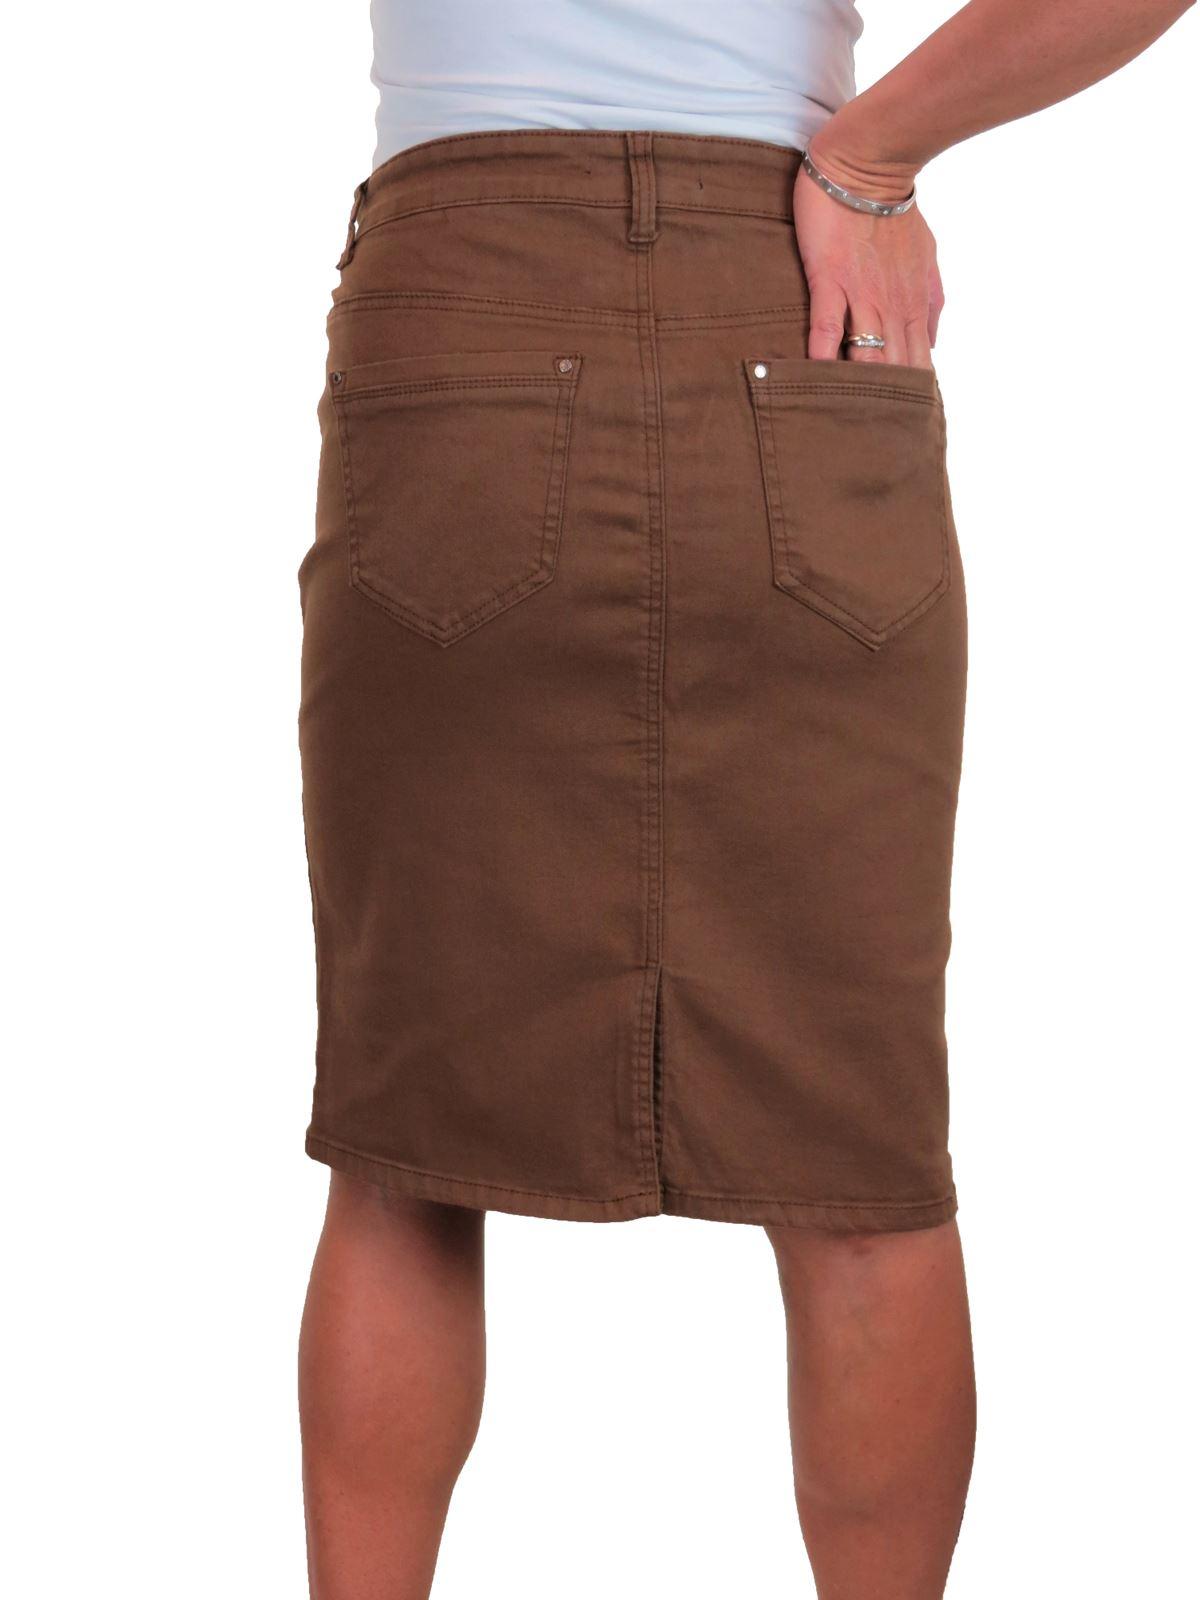 ICE-Womens-Good-Stretch-Jeans-Skirt-Knee-Length-14-22 thumbnail 8